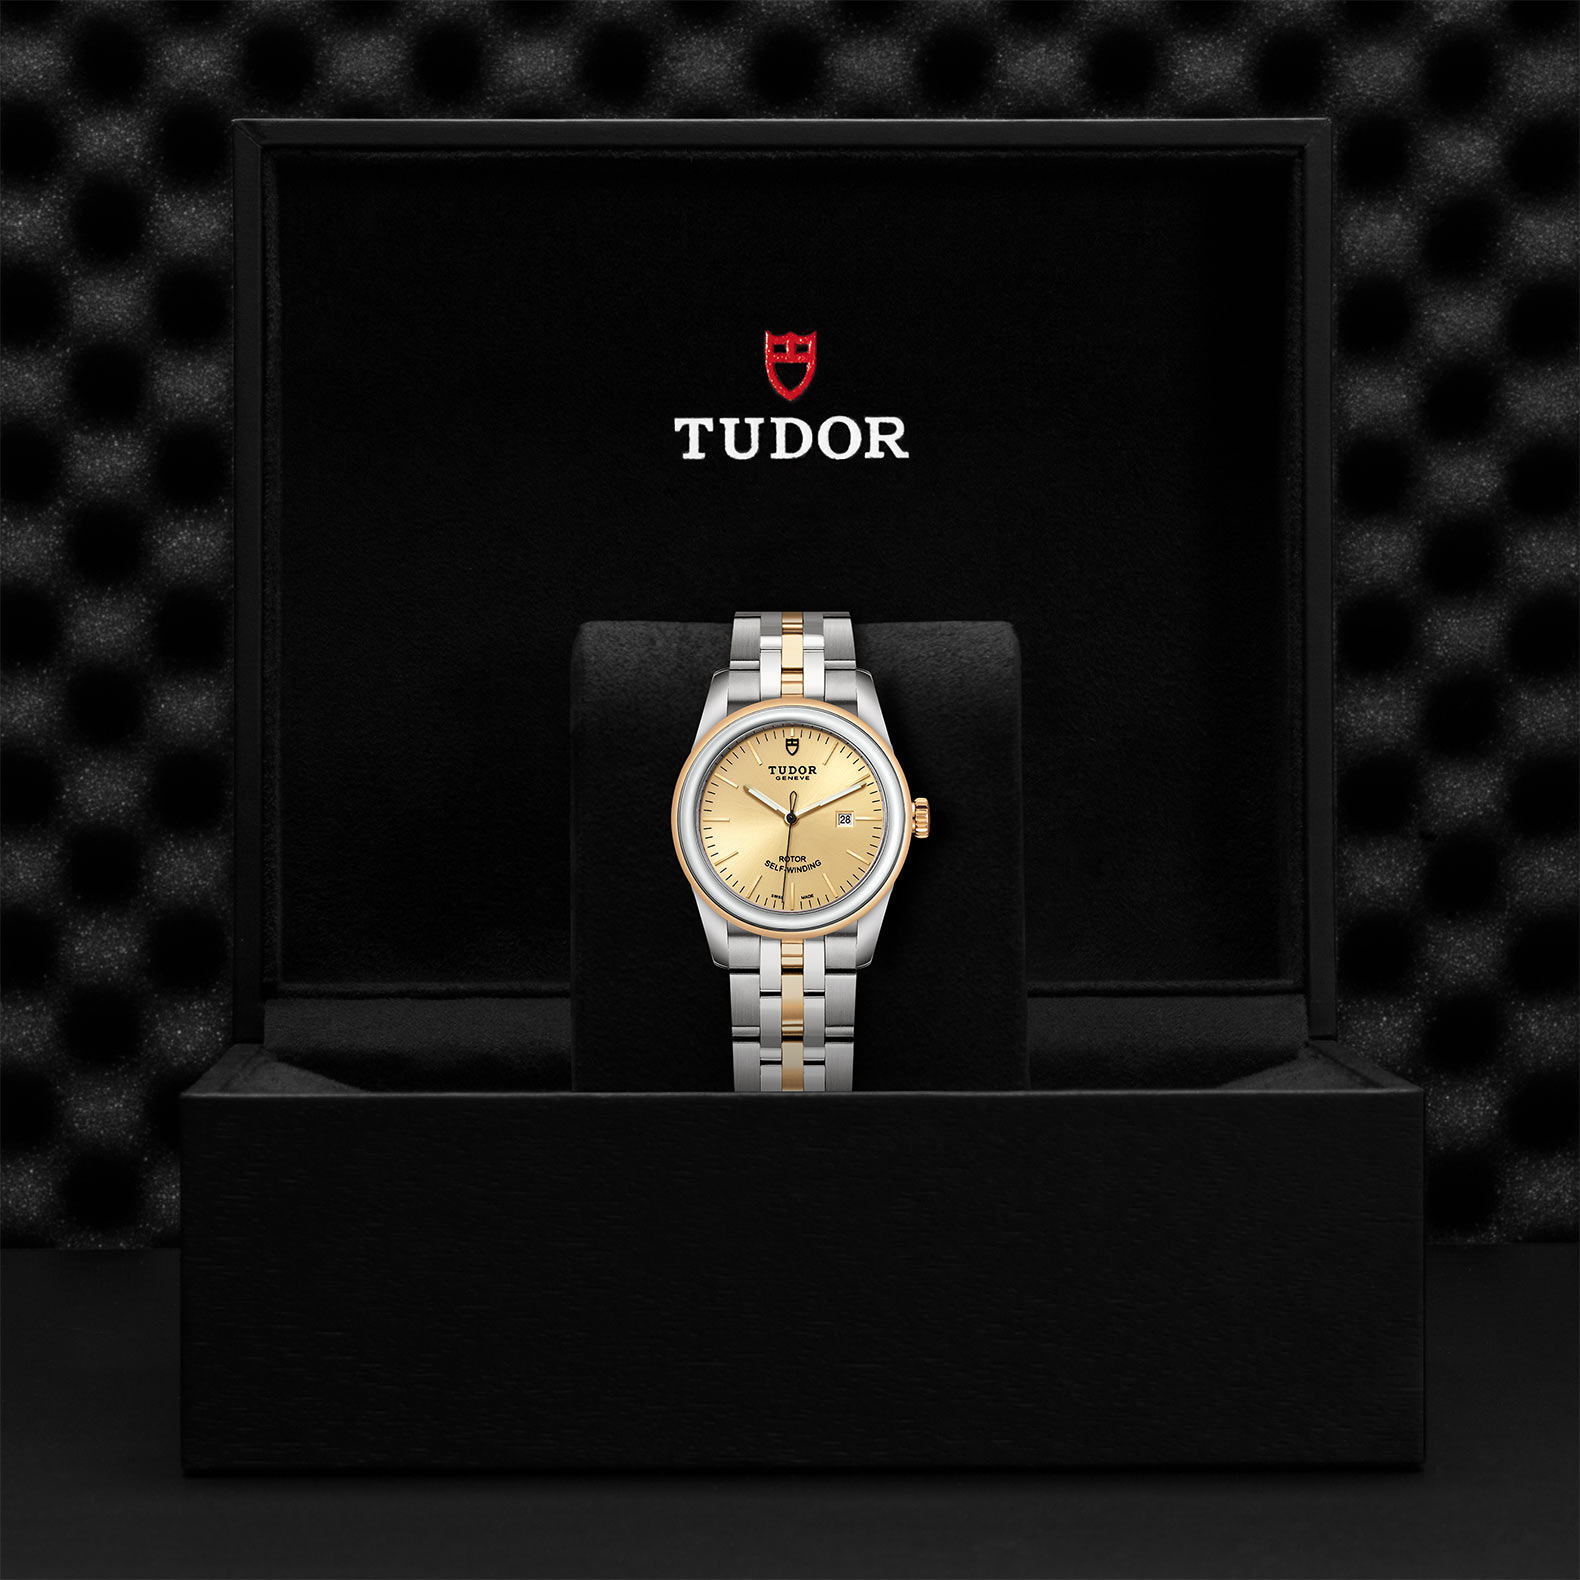 TUDOR Glamour Date M53003 0005 Presentationbox